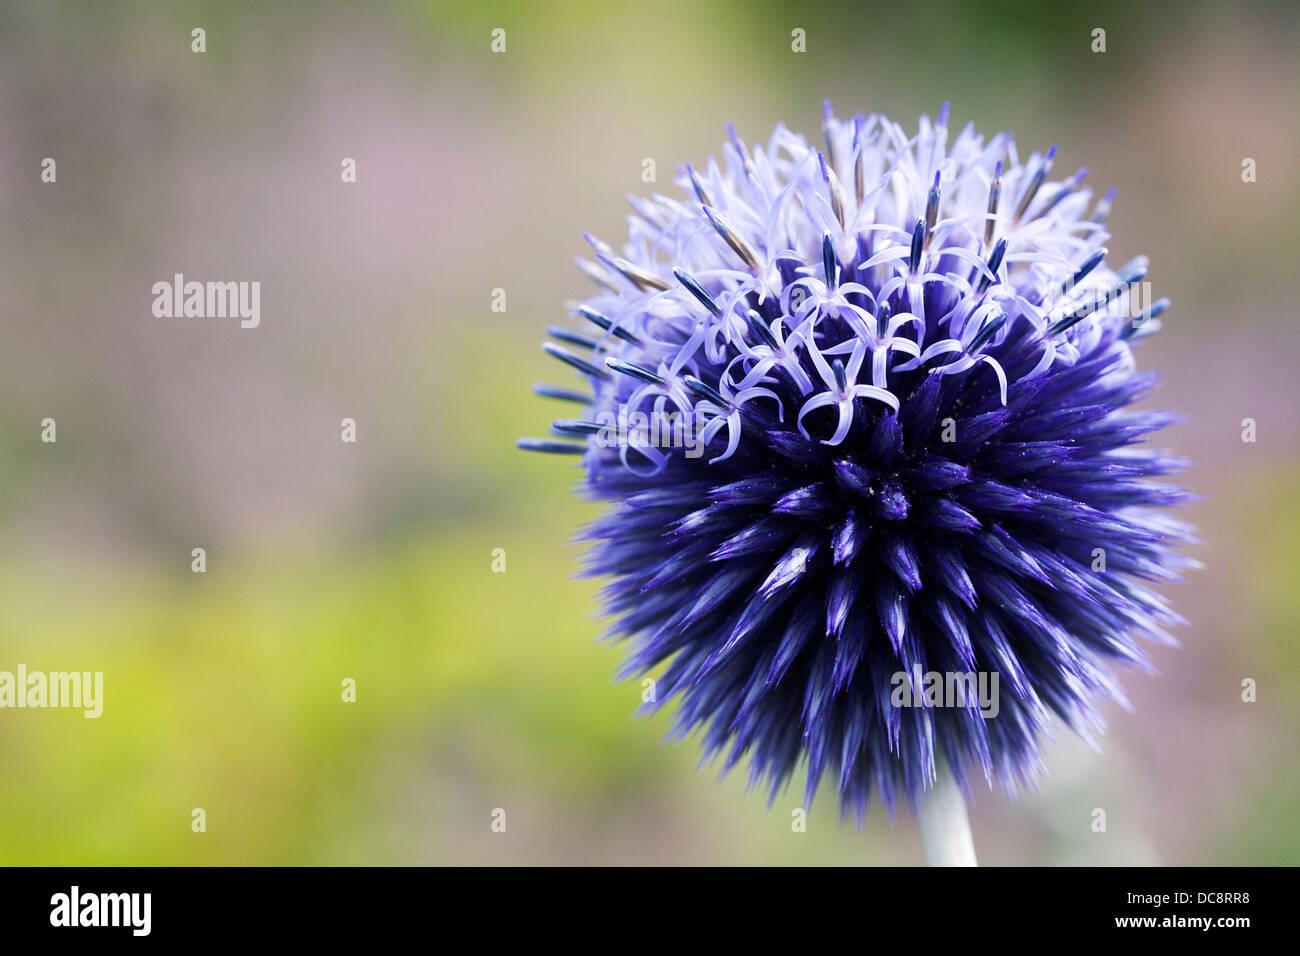 "Echinops bannaticus "" Taplow blu"". Globo fiore di cardo. Immagini Stock"